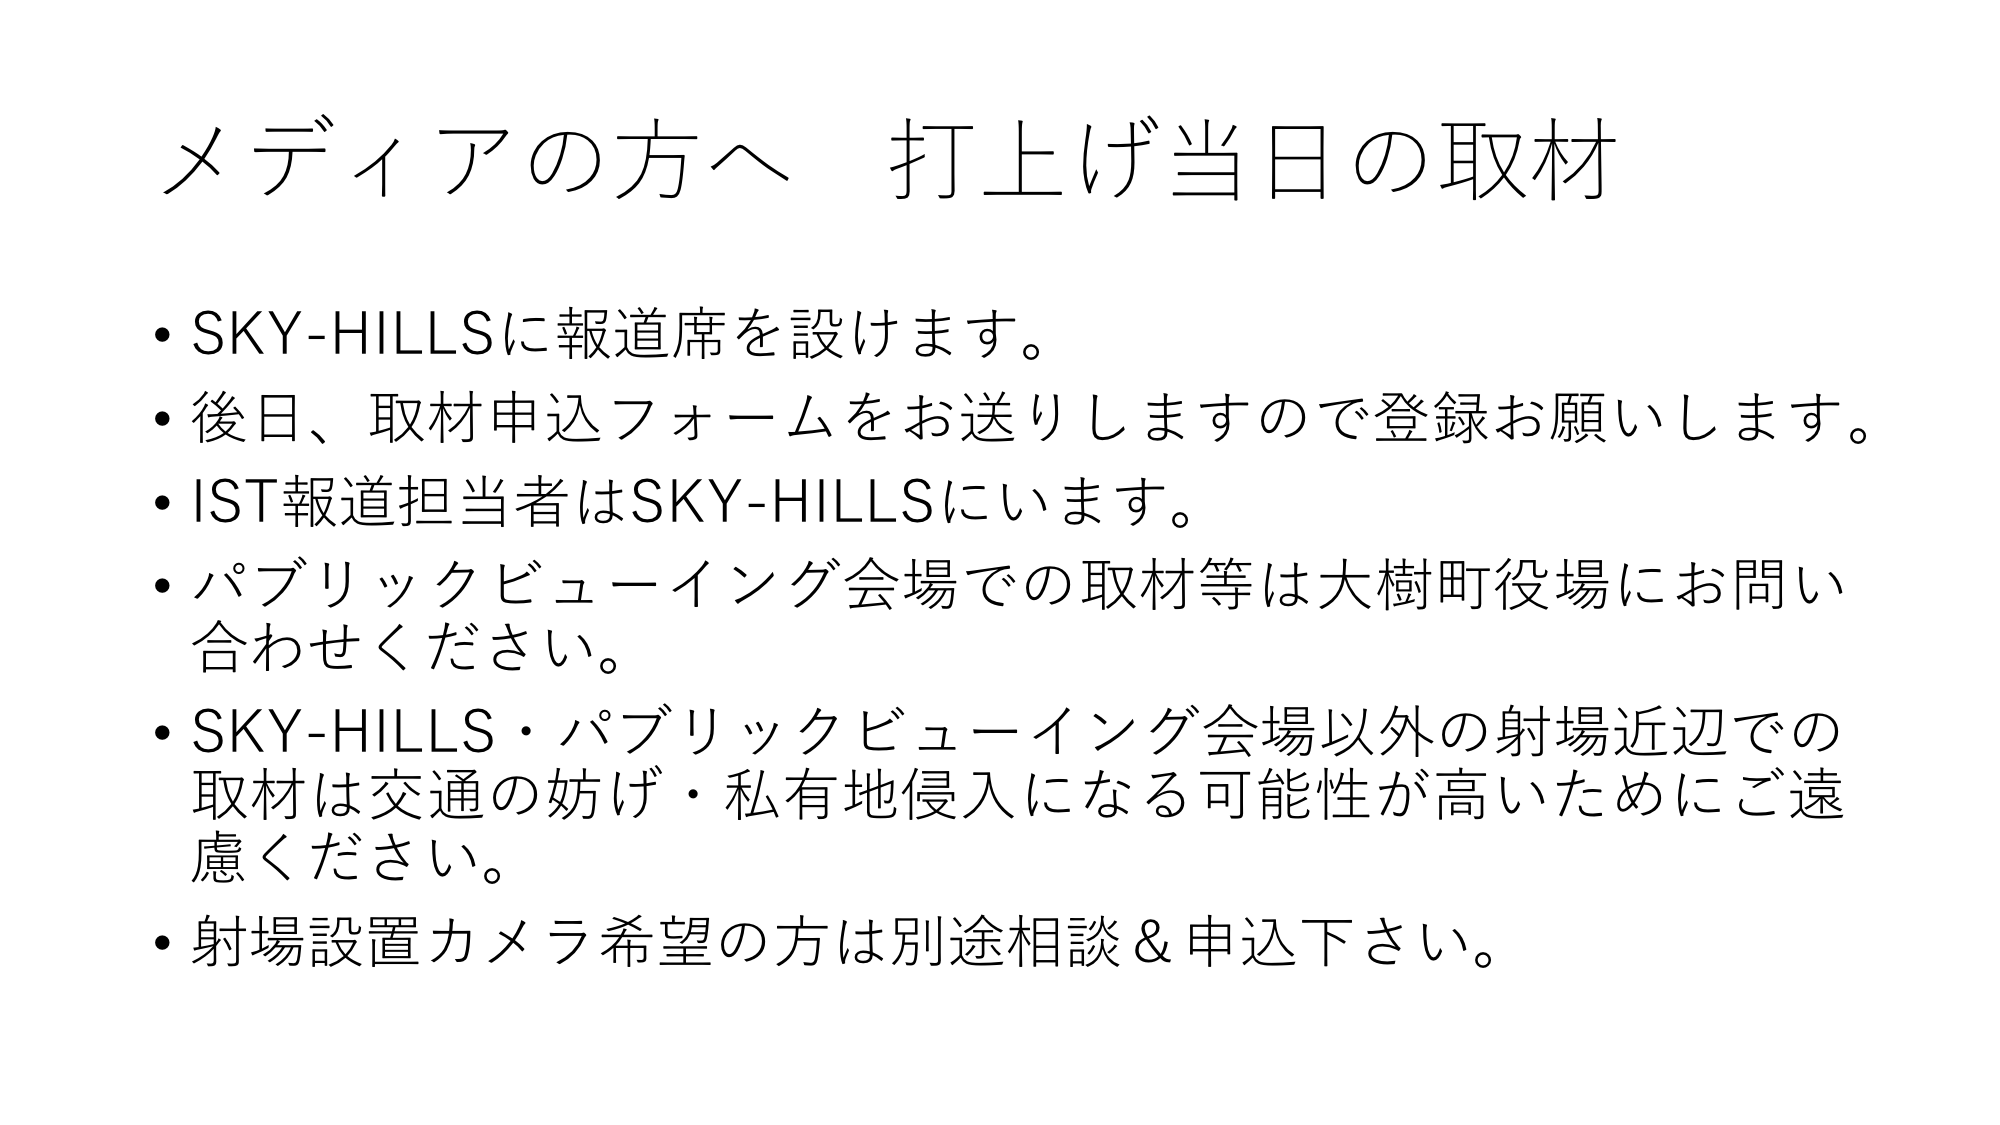 f:id:Imamura:20190414214005p:plain